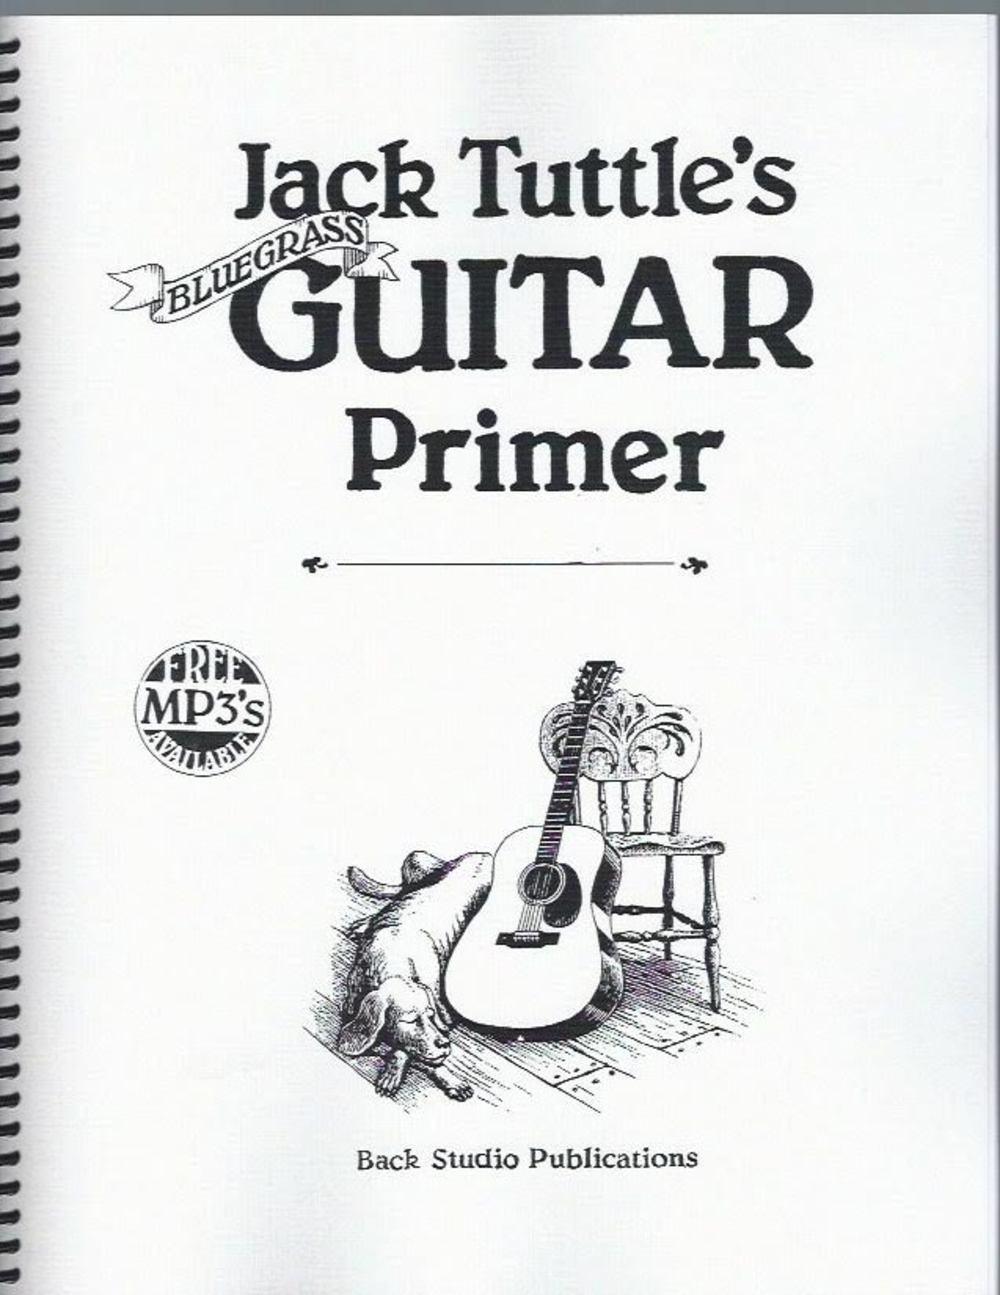 Jack Tuttle's Bluegrass Guitar Primer